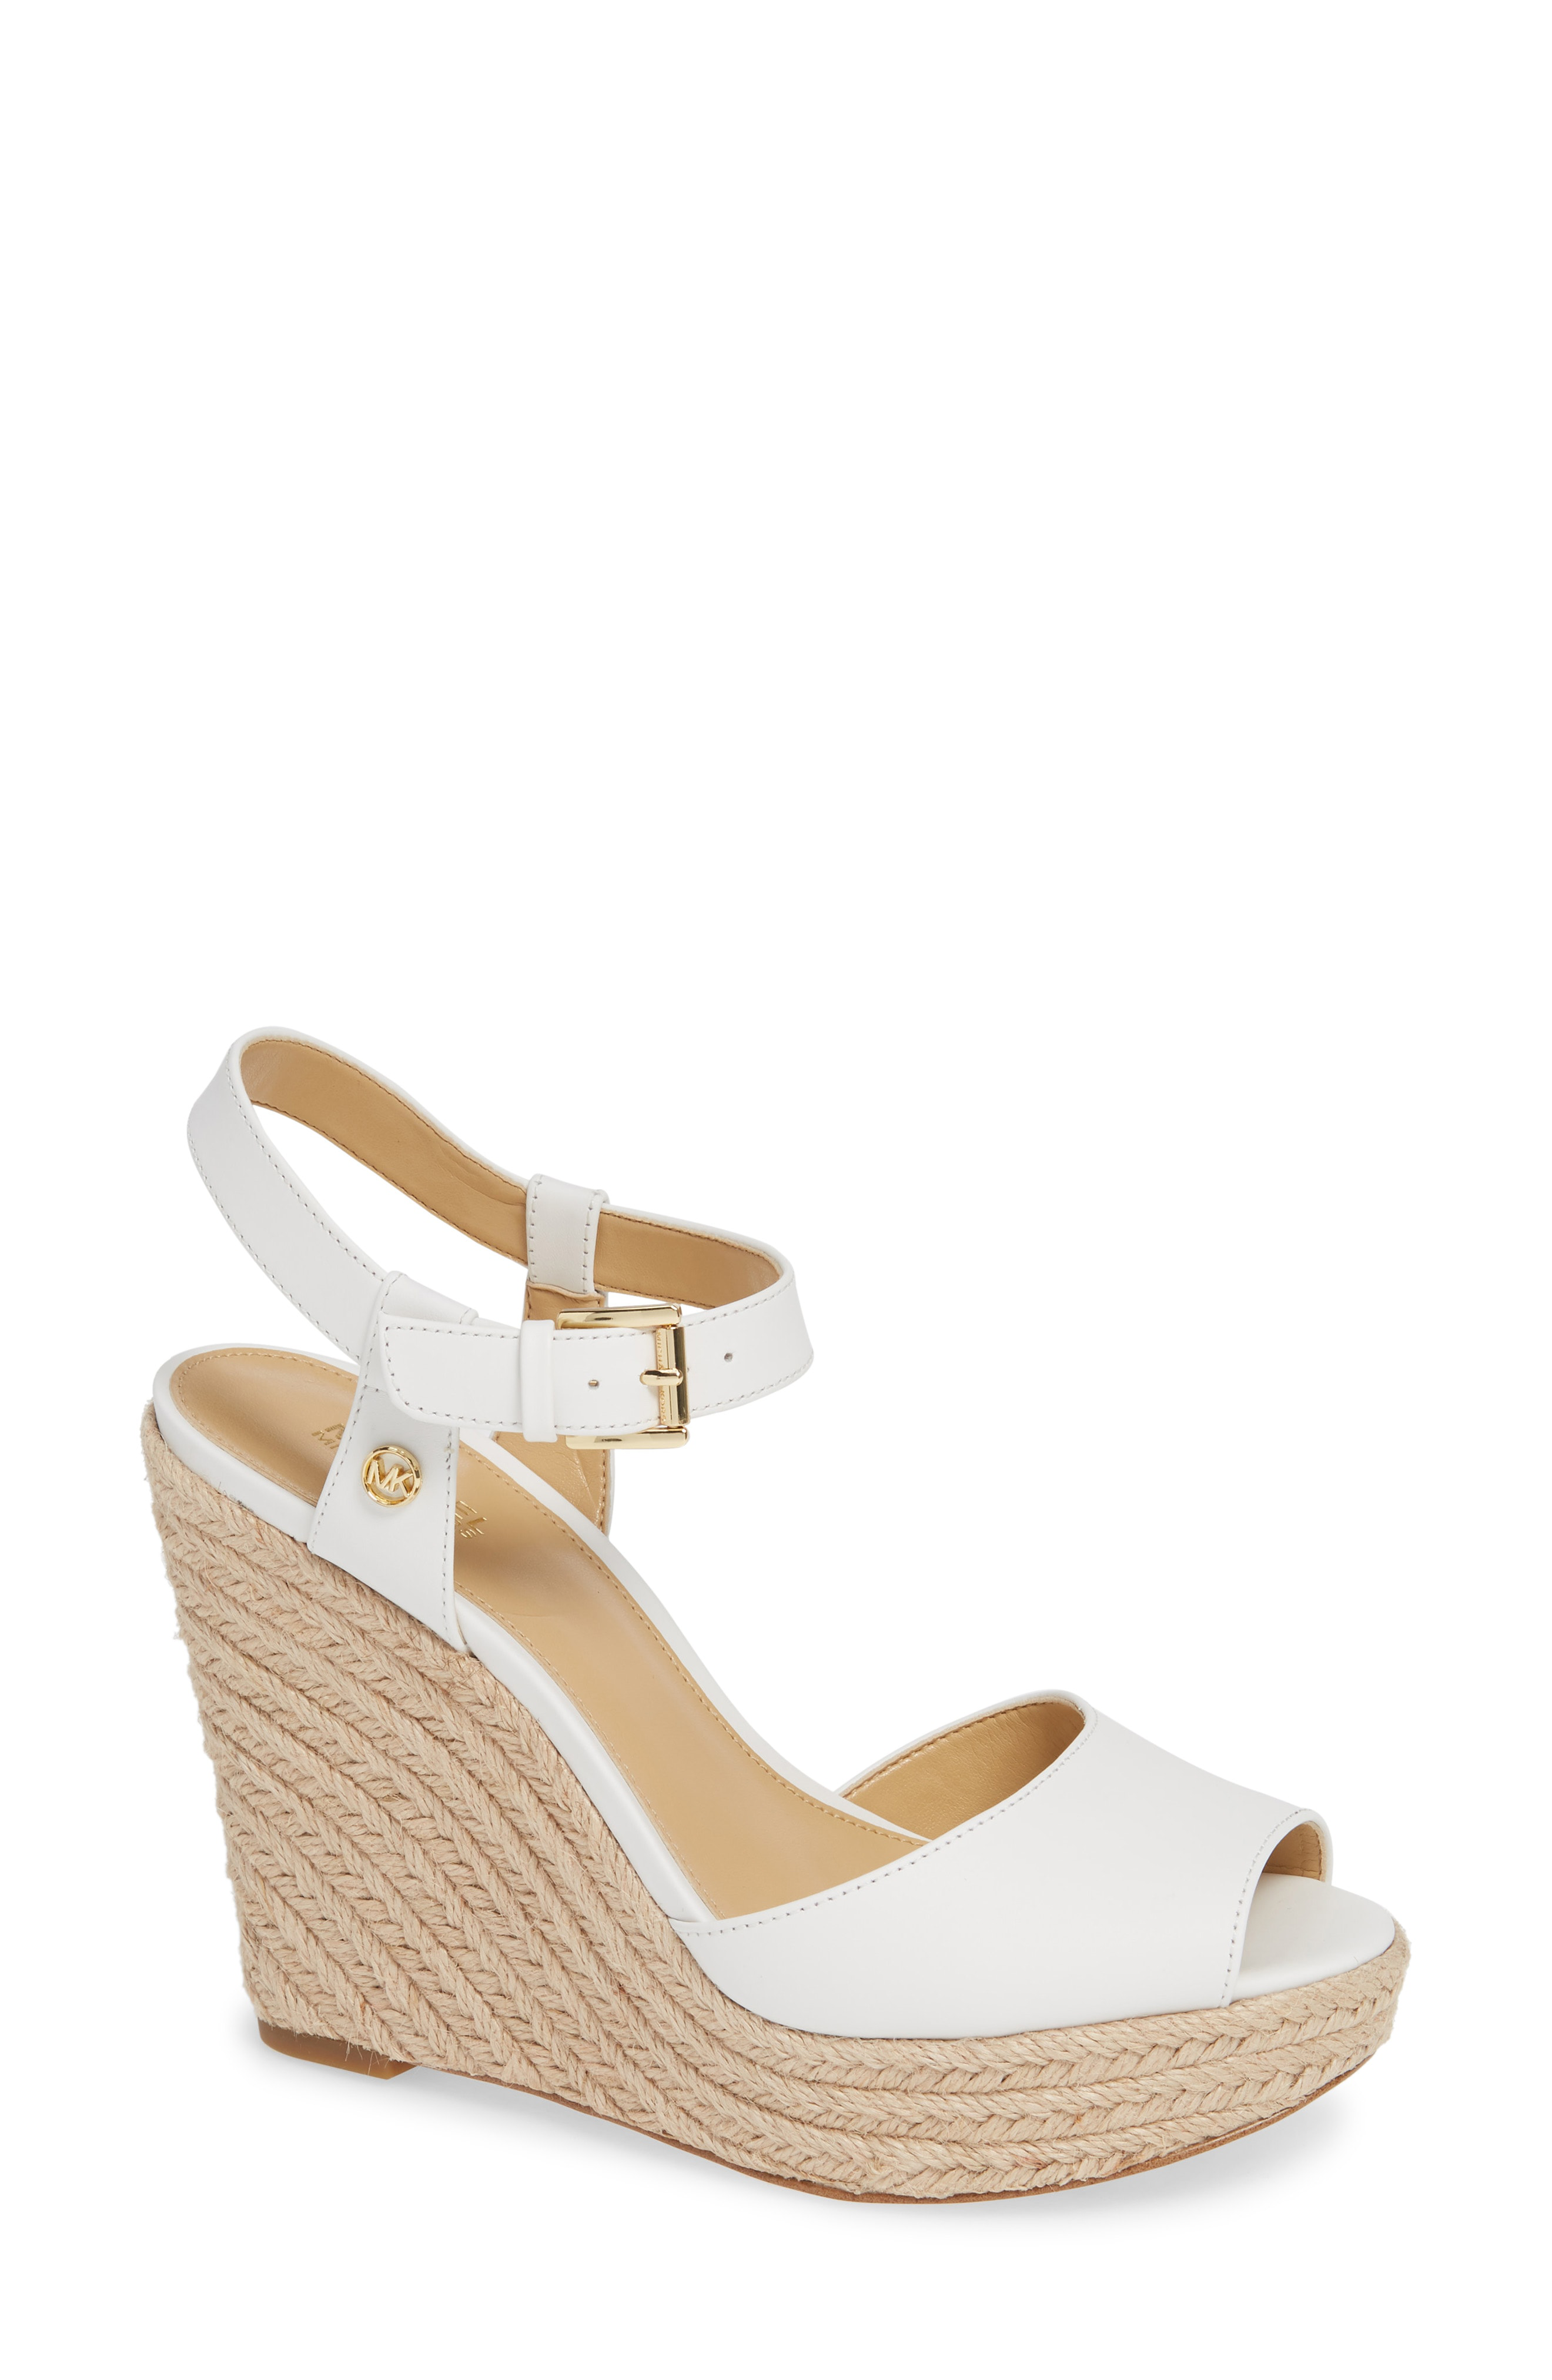 b264404cb7f0 Michael Michael Kors Carlyn Espadrille Wedge Sandal In White Vachetta  Leather